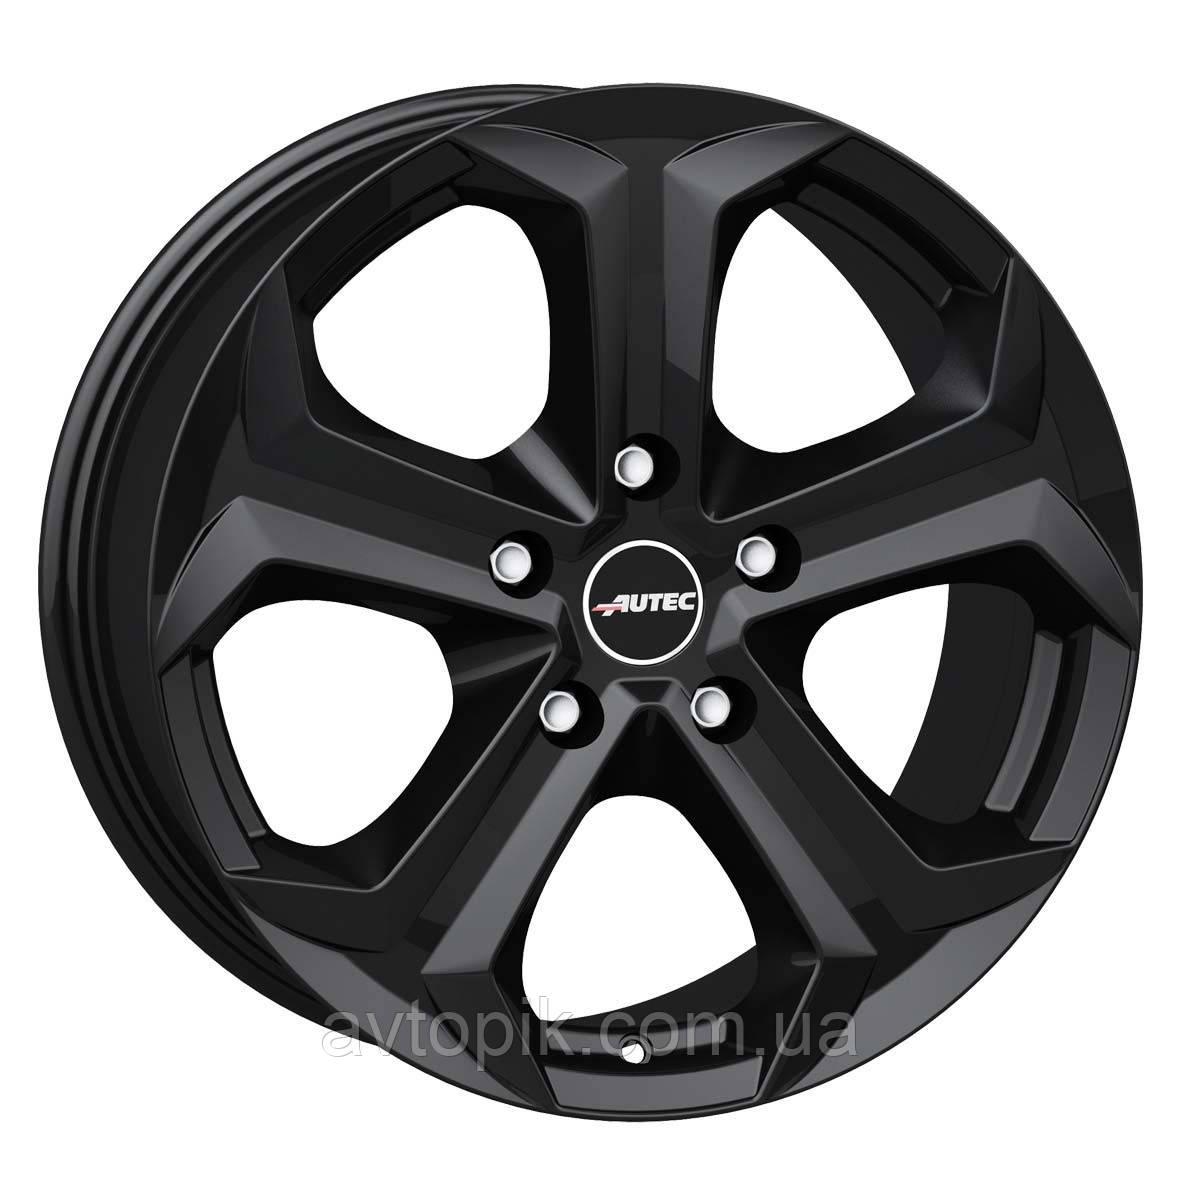 Литые диски Autec Xenos R17 W7 PCD5x114.3 ET42 DIA66.1 (matt black)